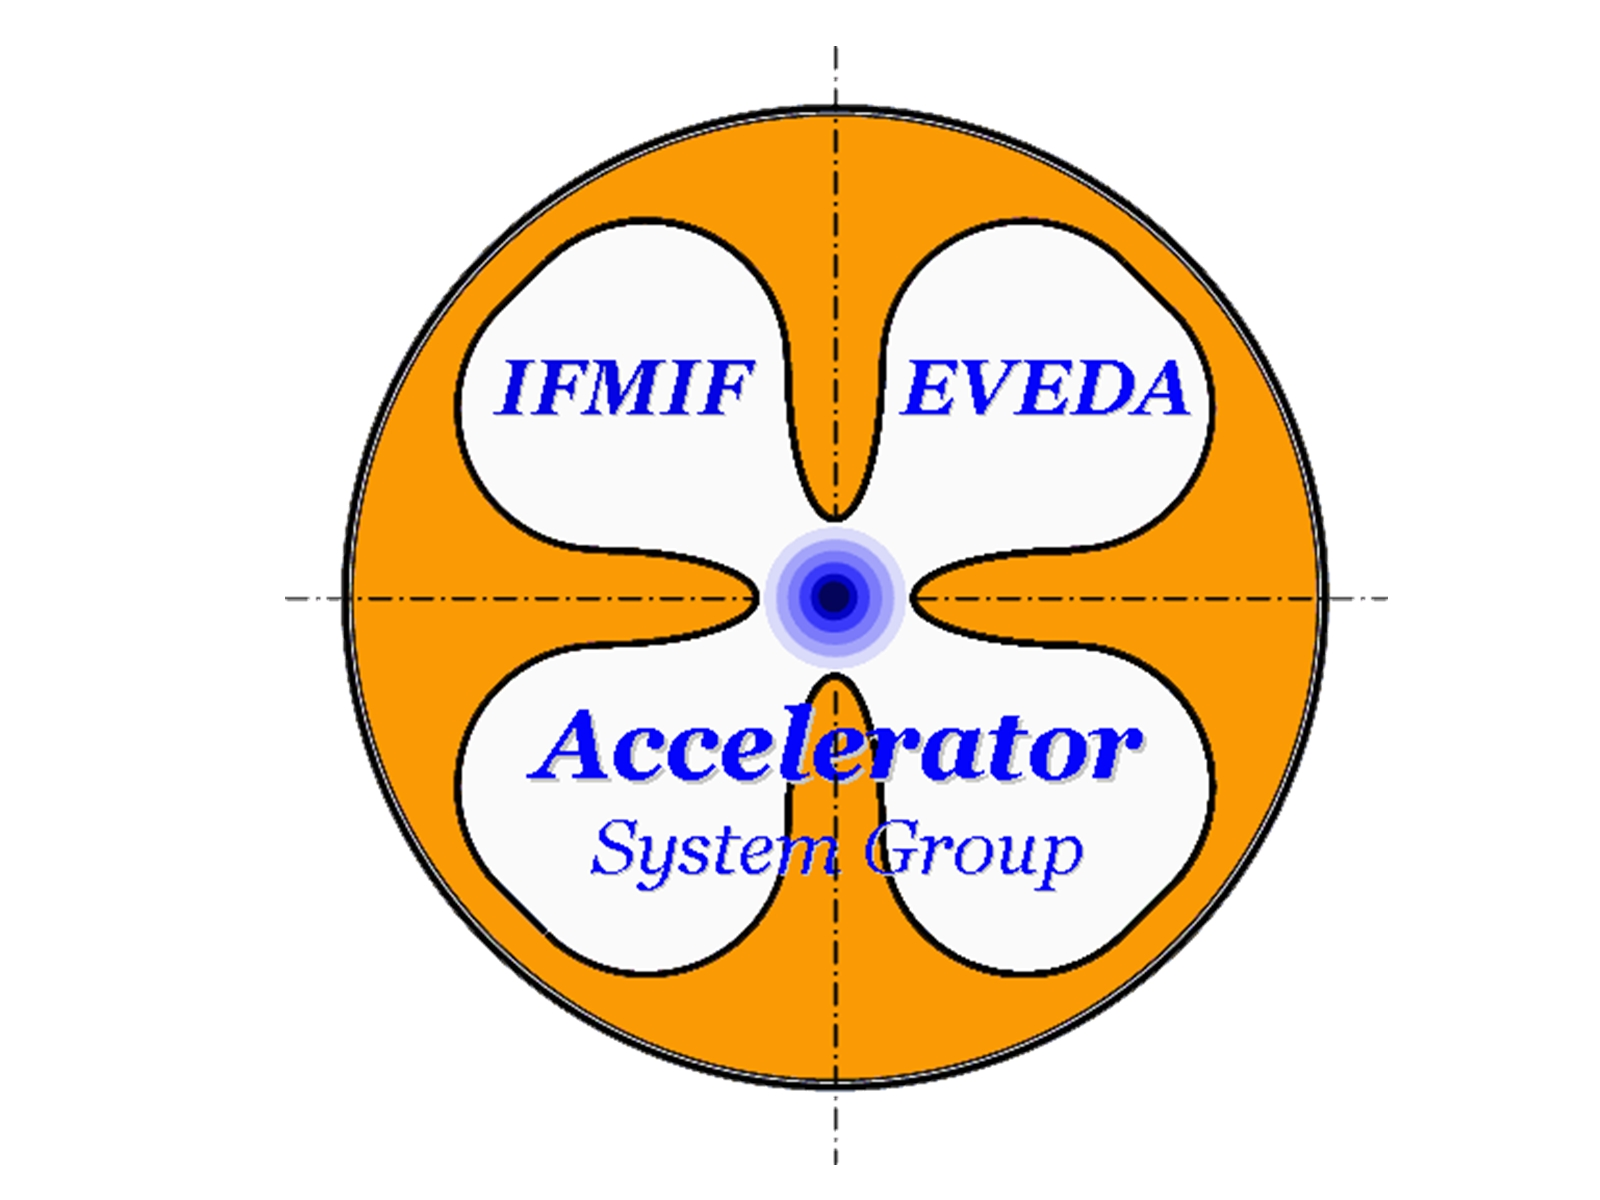 IFMIF-EVEDA